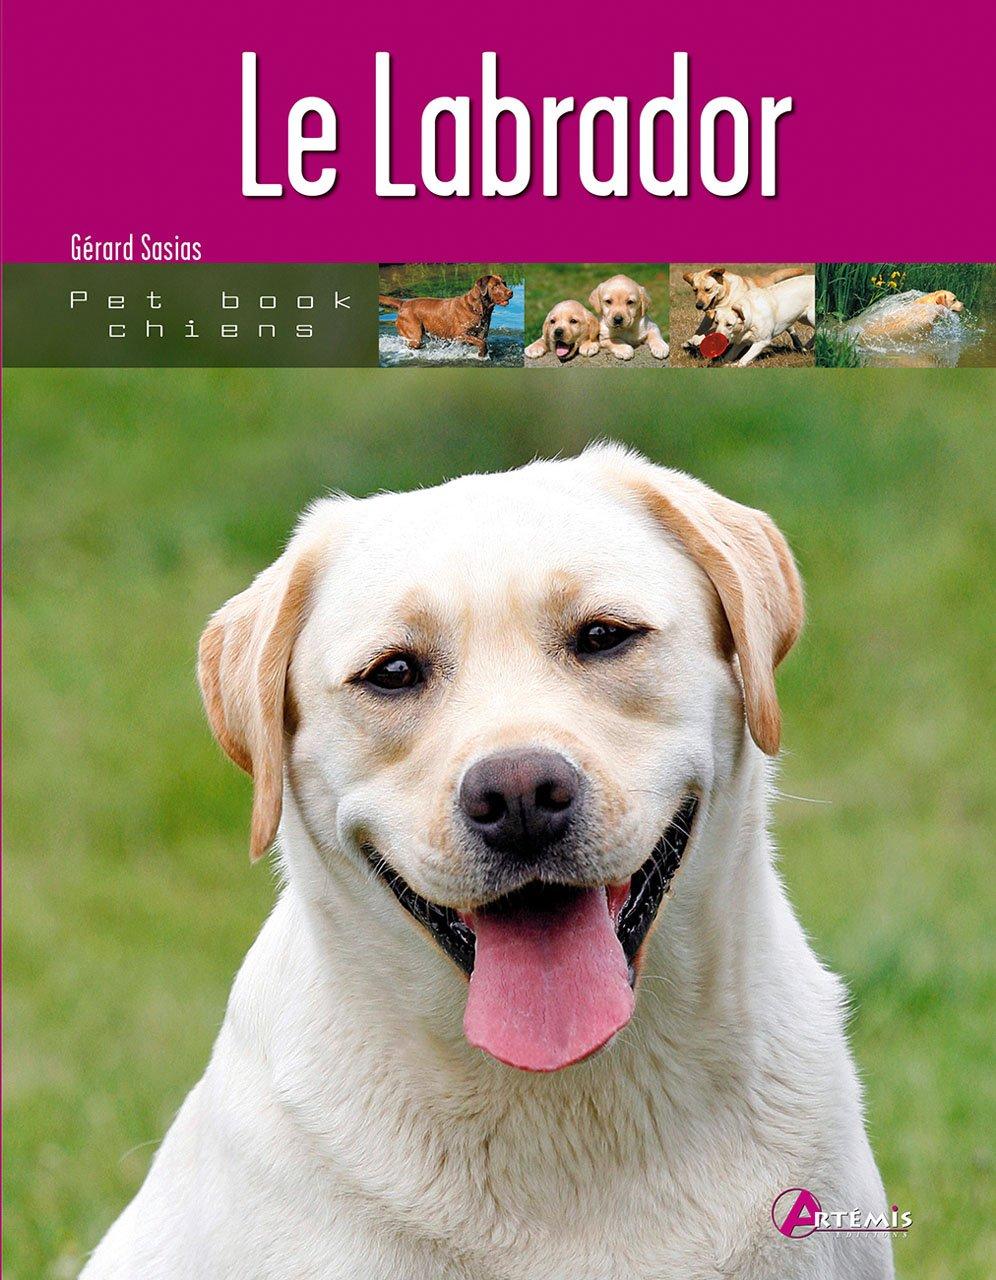 Le Labrador Broché – 14 août 2007 Gérard Sasias Editions Artémis 284416630X TL284416630X